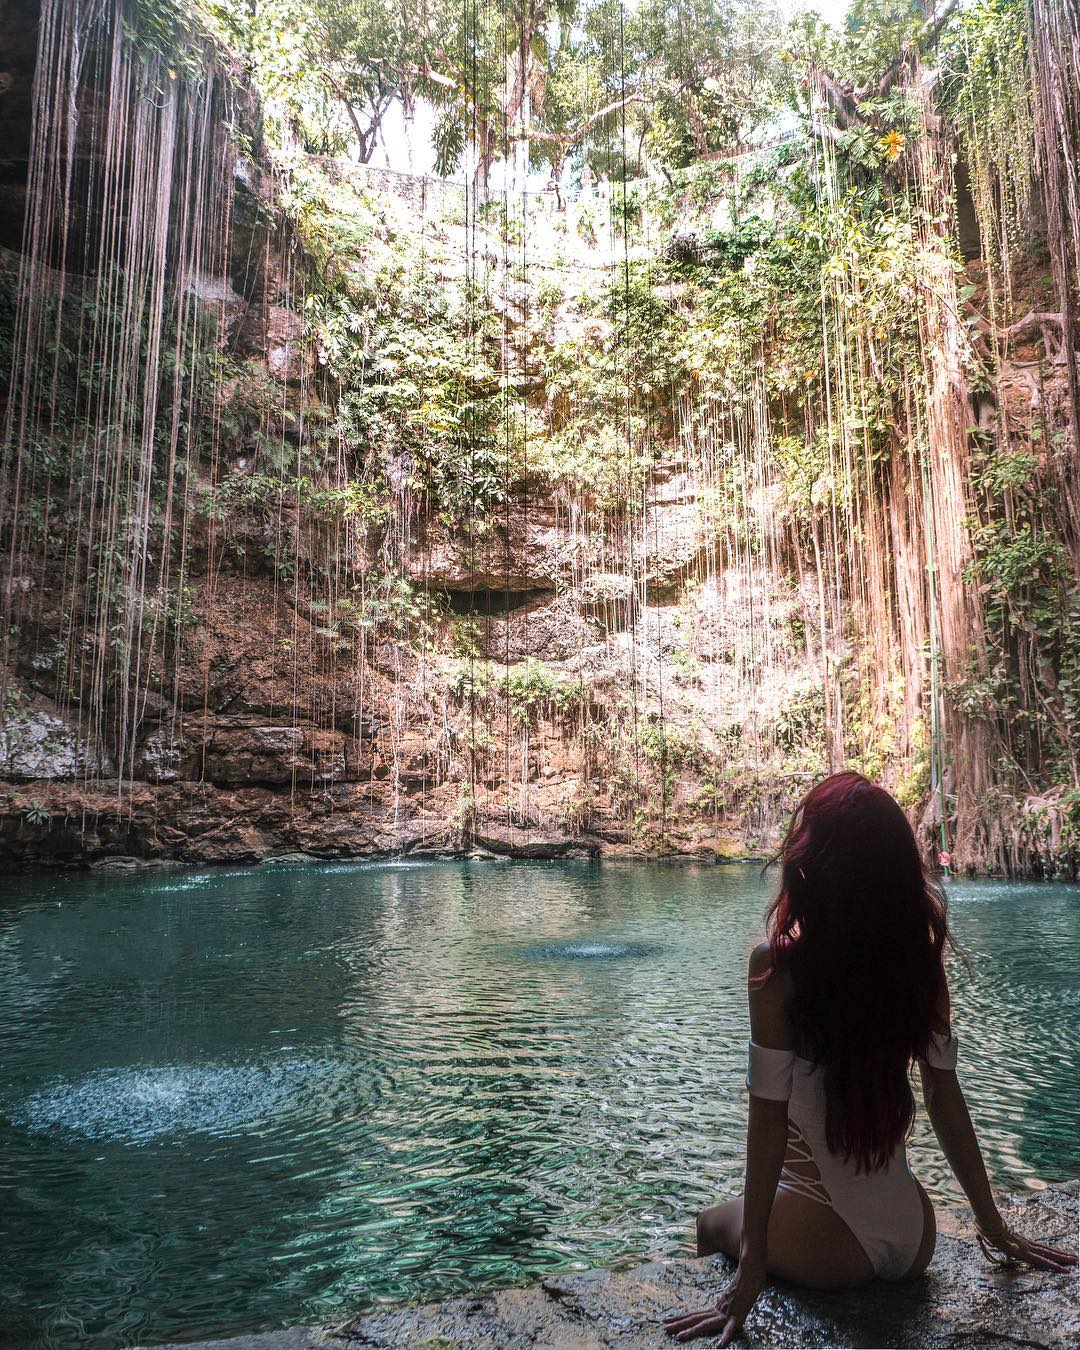 Cenote ik kil, top yucatan cenotes, mejores cenotes peninsula de yucatan